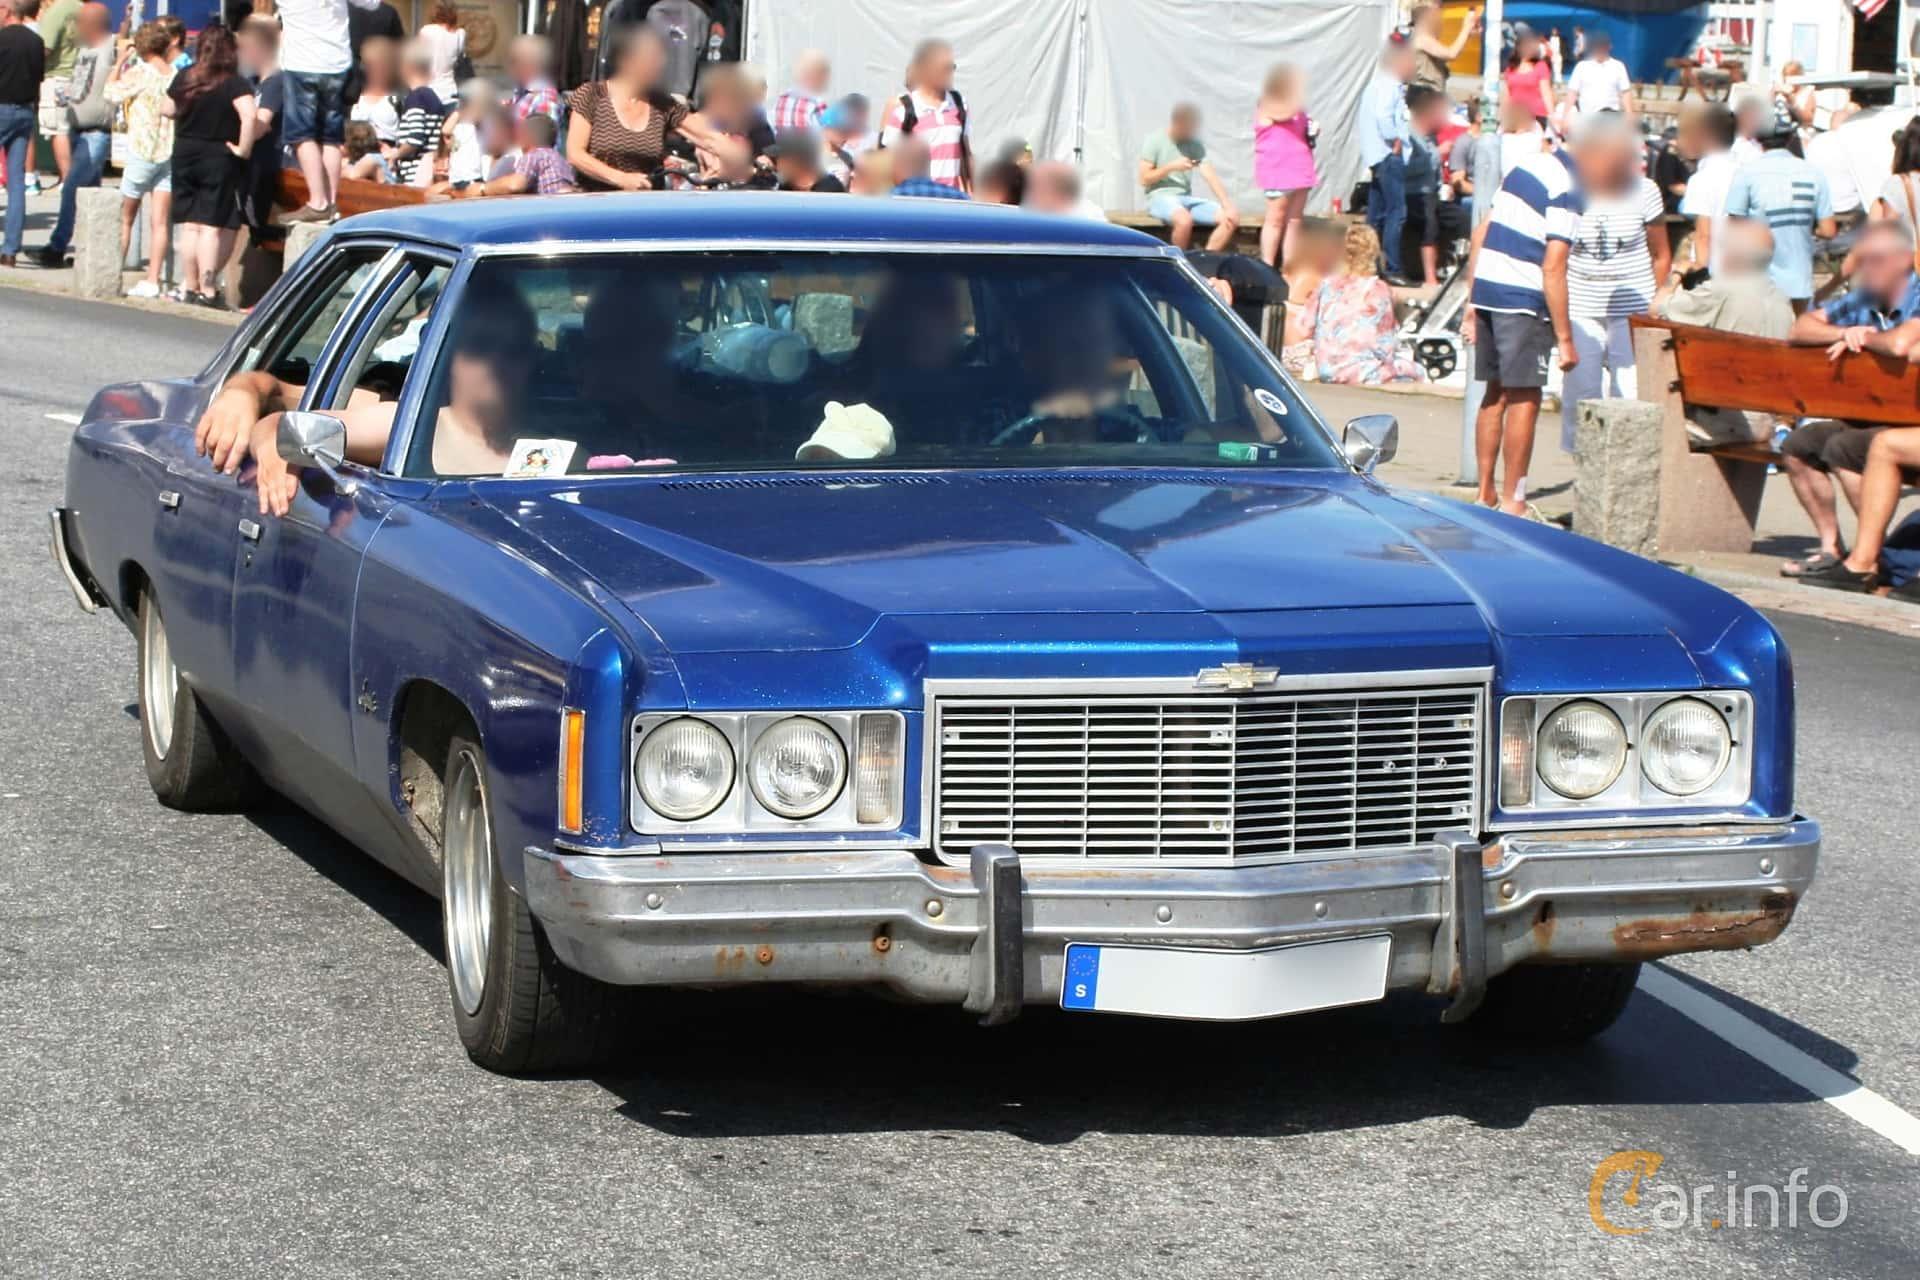 1 Images Of Chevrolet Impala Sedan 6 6 V8 Hydra Matic 177hp